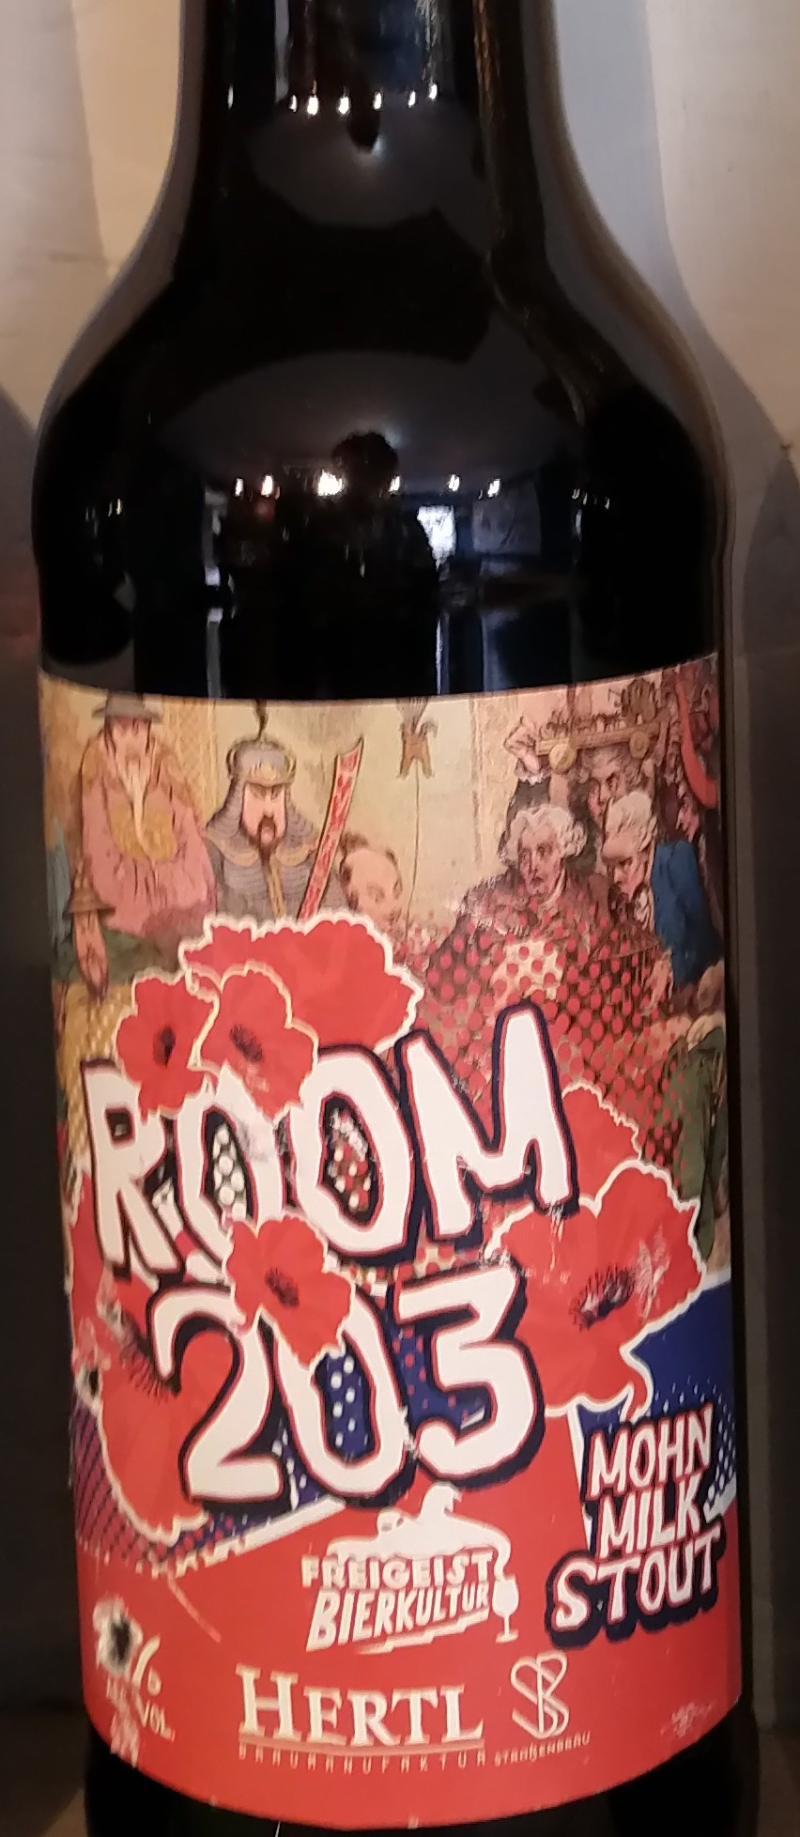 room 203 mohn ale